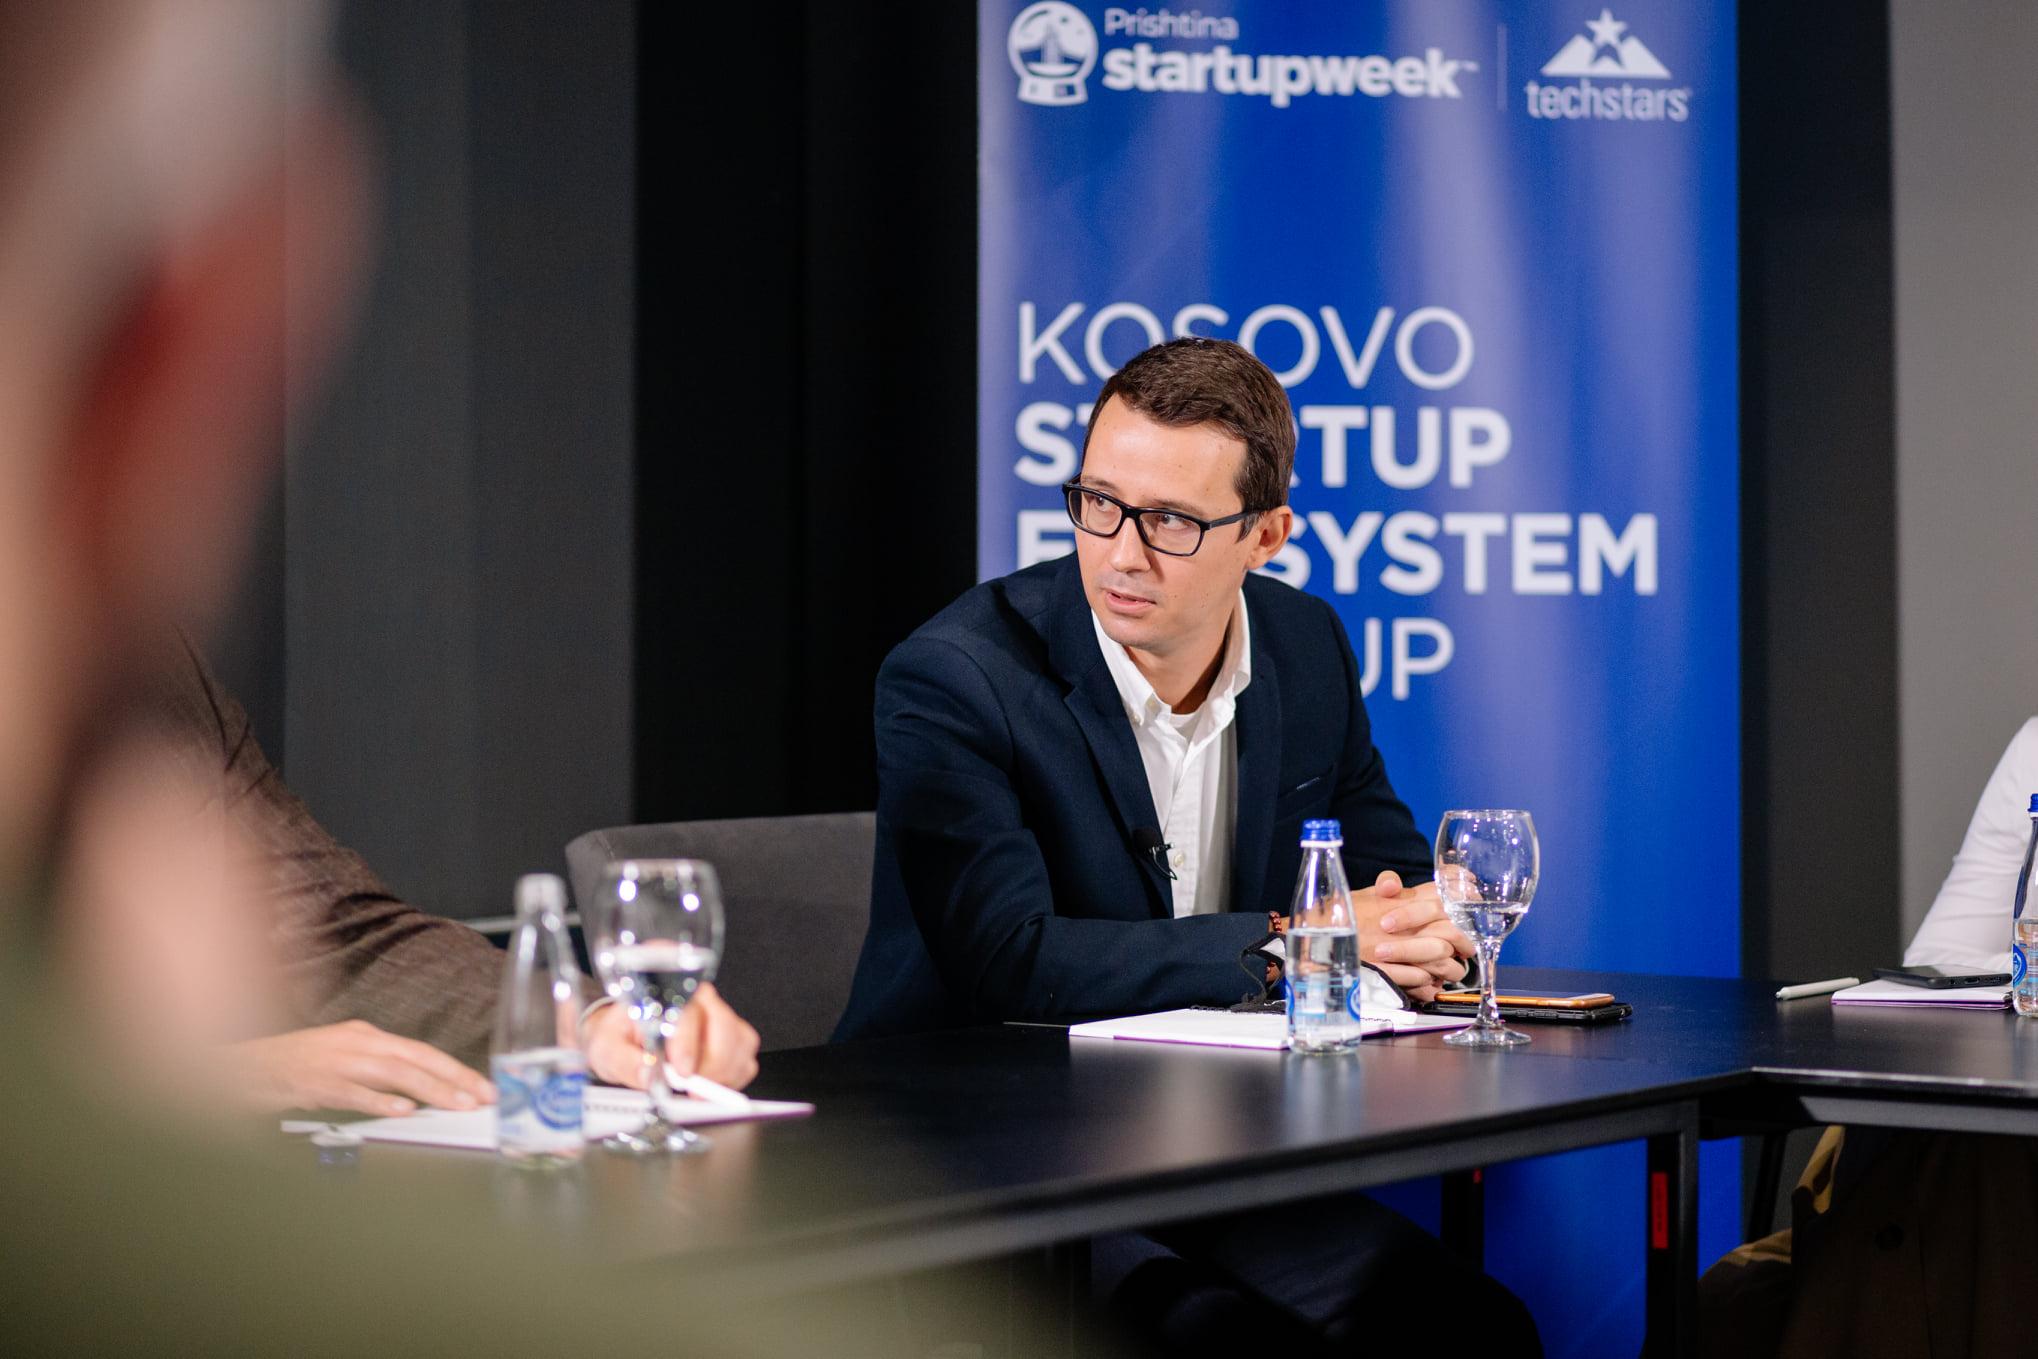 Techstar's Startup Week drumrolls with Kosovo's Startup Ecosystem Meetup